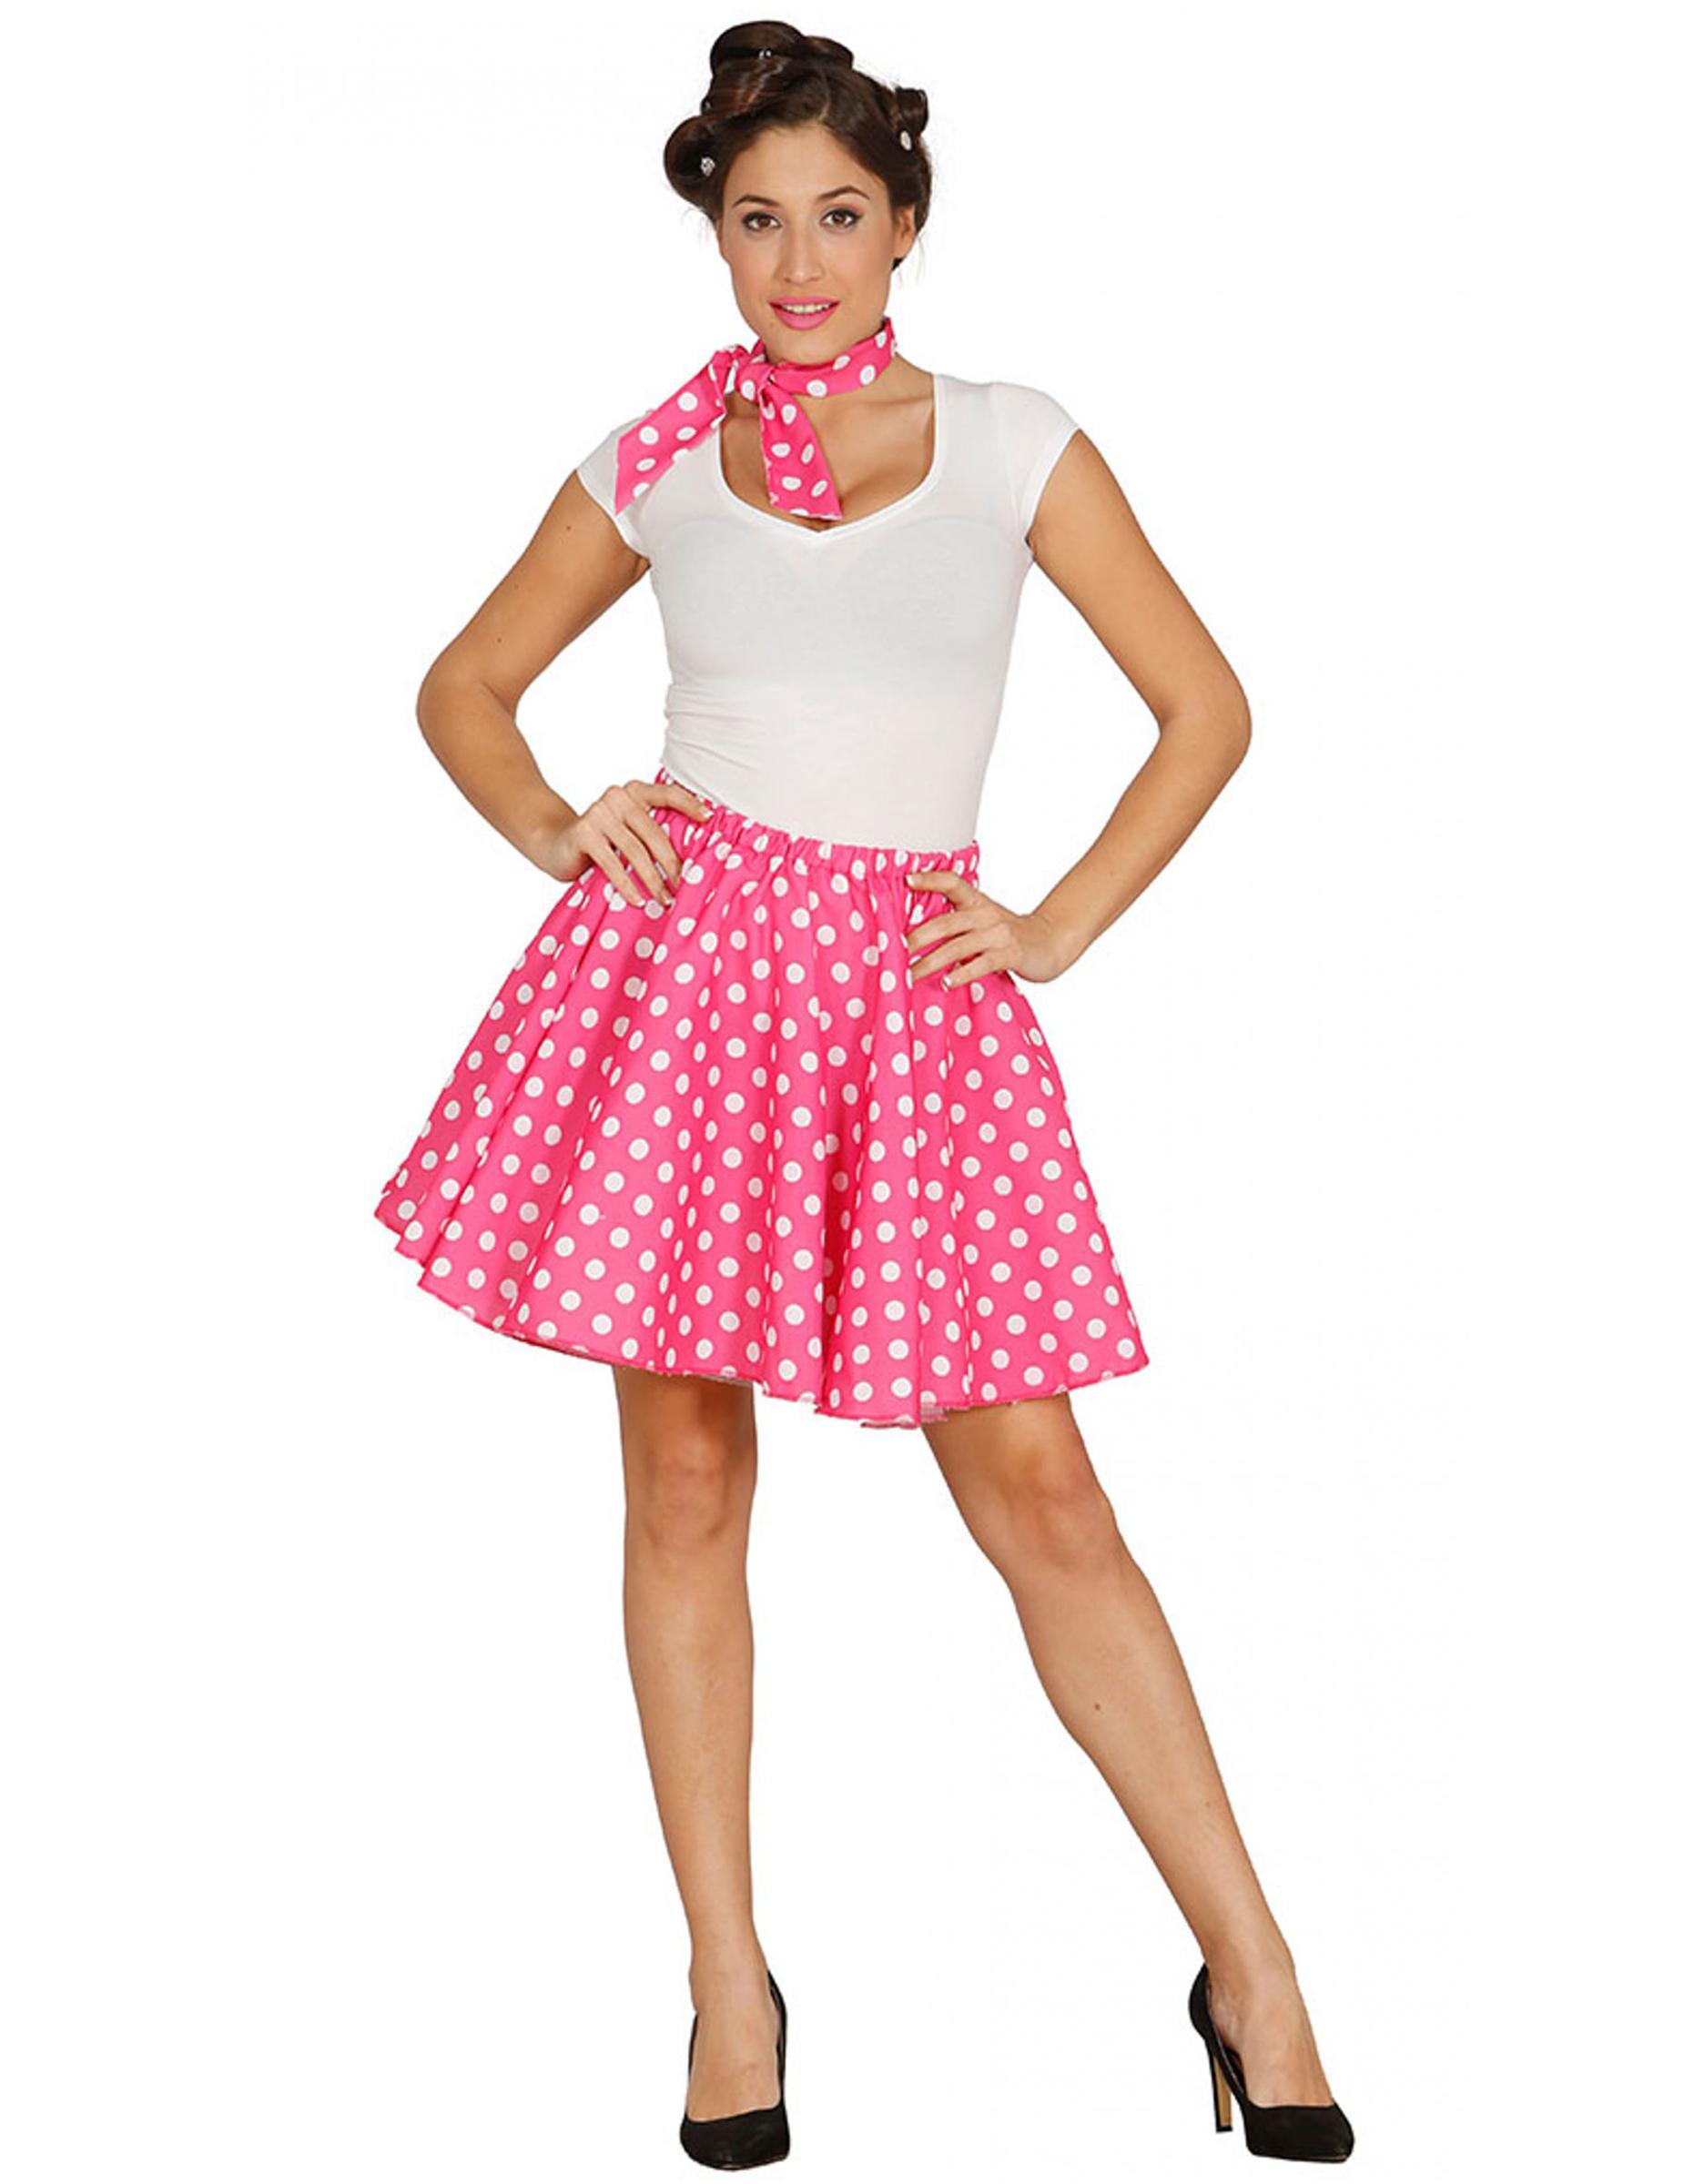 Gonna e foulard rosa a pois donna  Costumi adulti 9443efdac6d